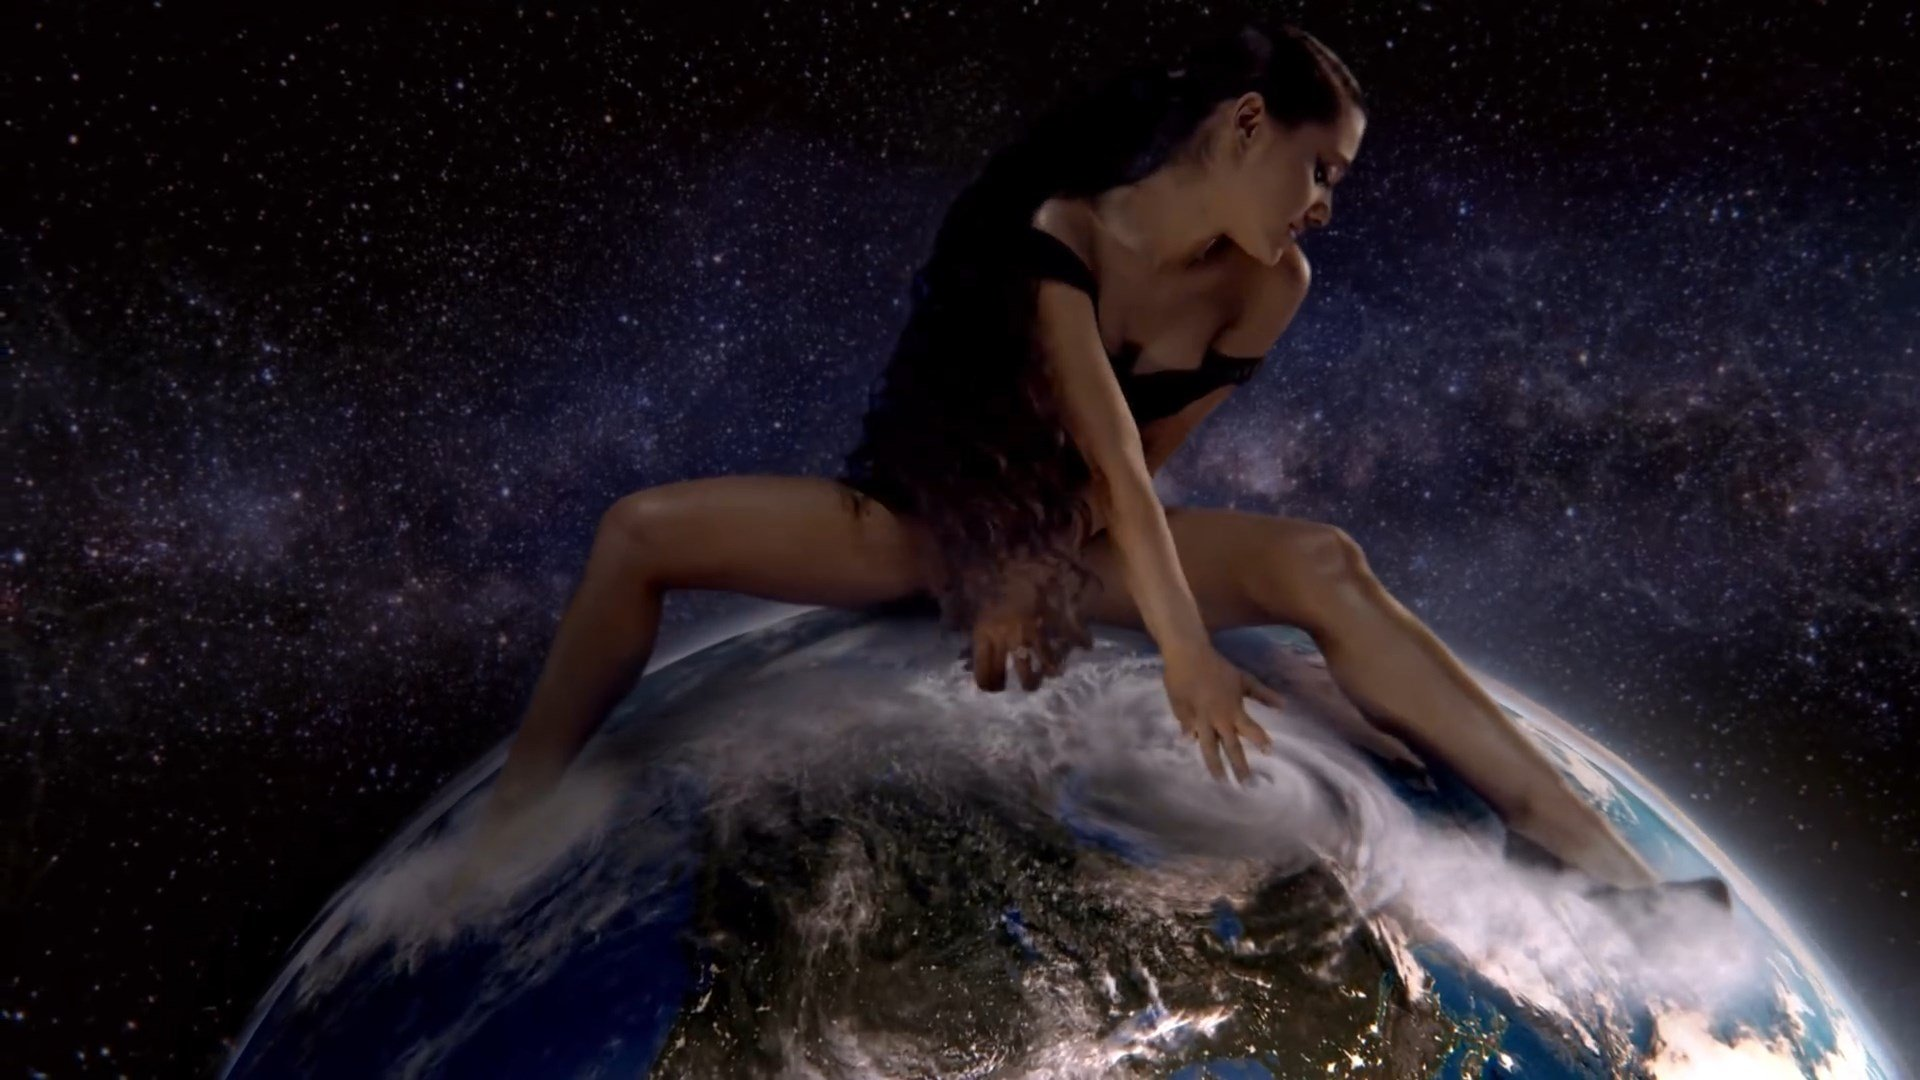 video leaked Ariana grande